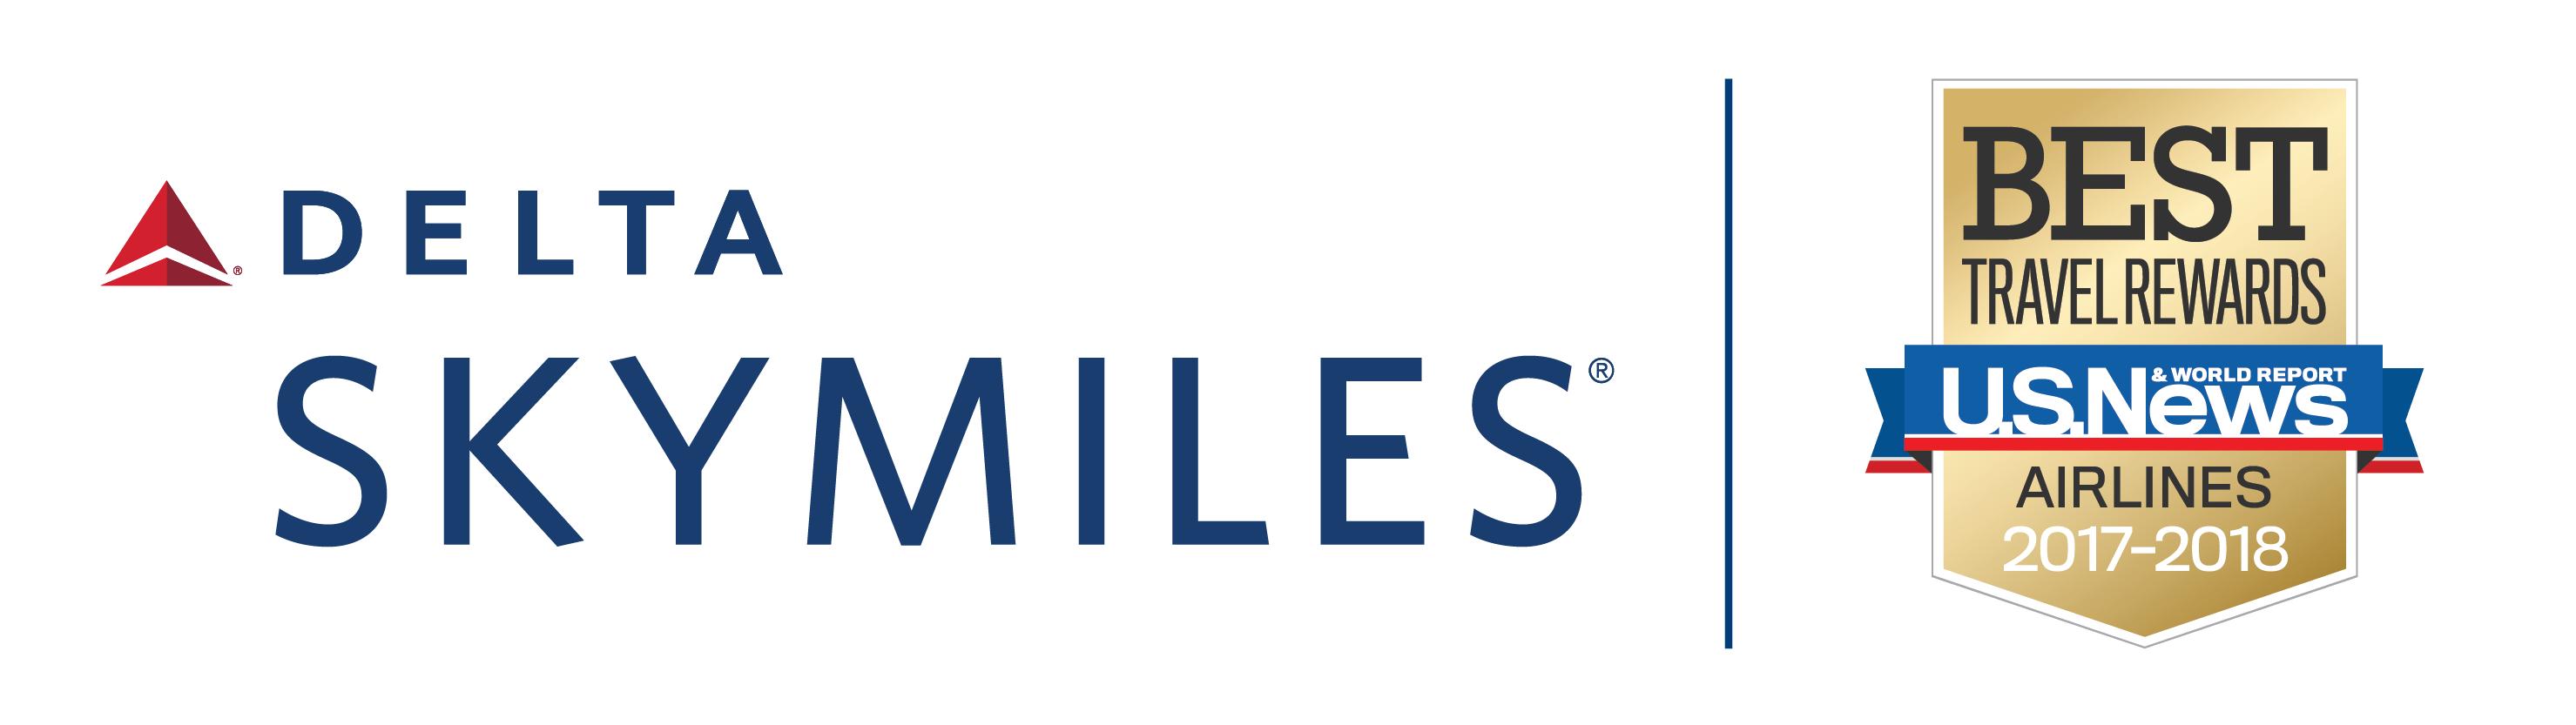 Skymiles Us News Award Logo Lockup